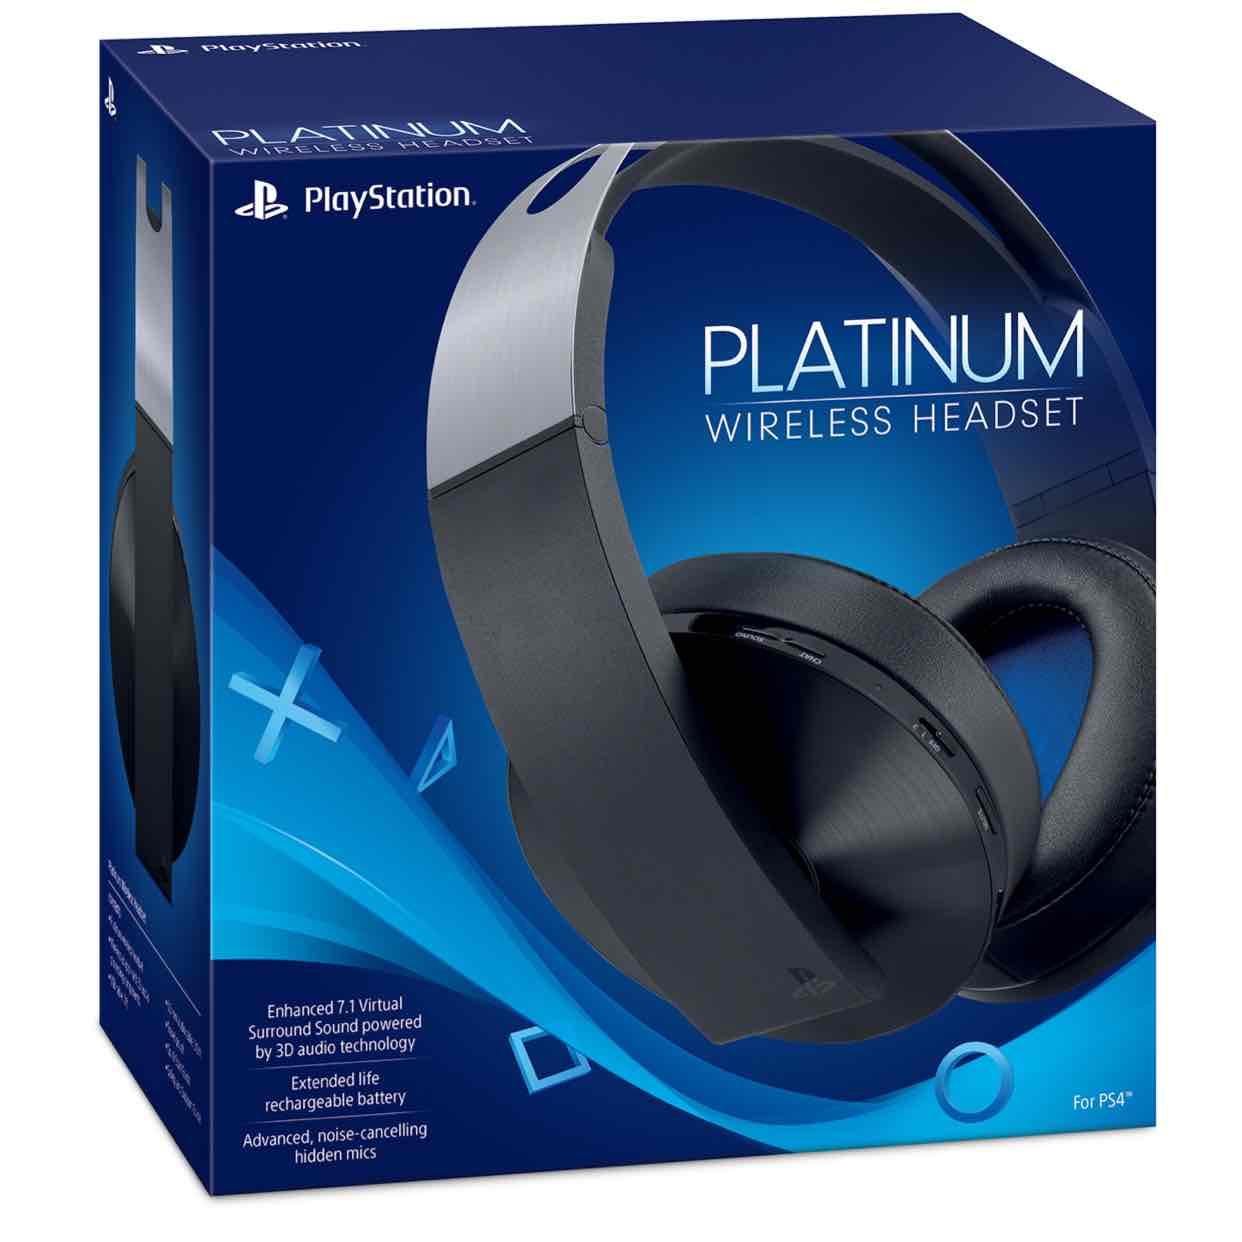 Sony PlayStation Wireless Platinum 7.1 headset